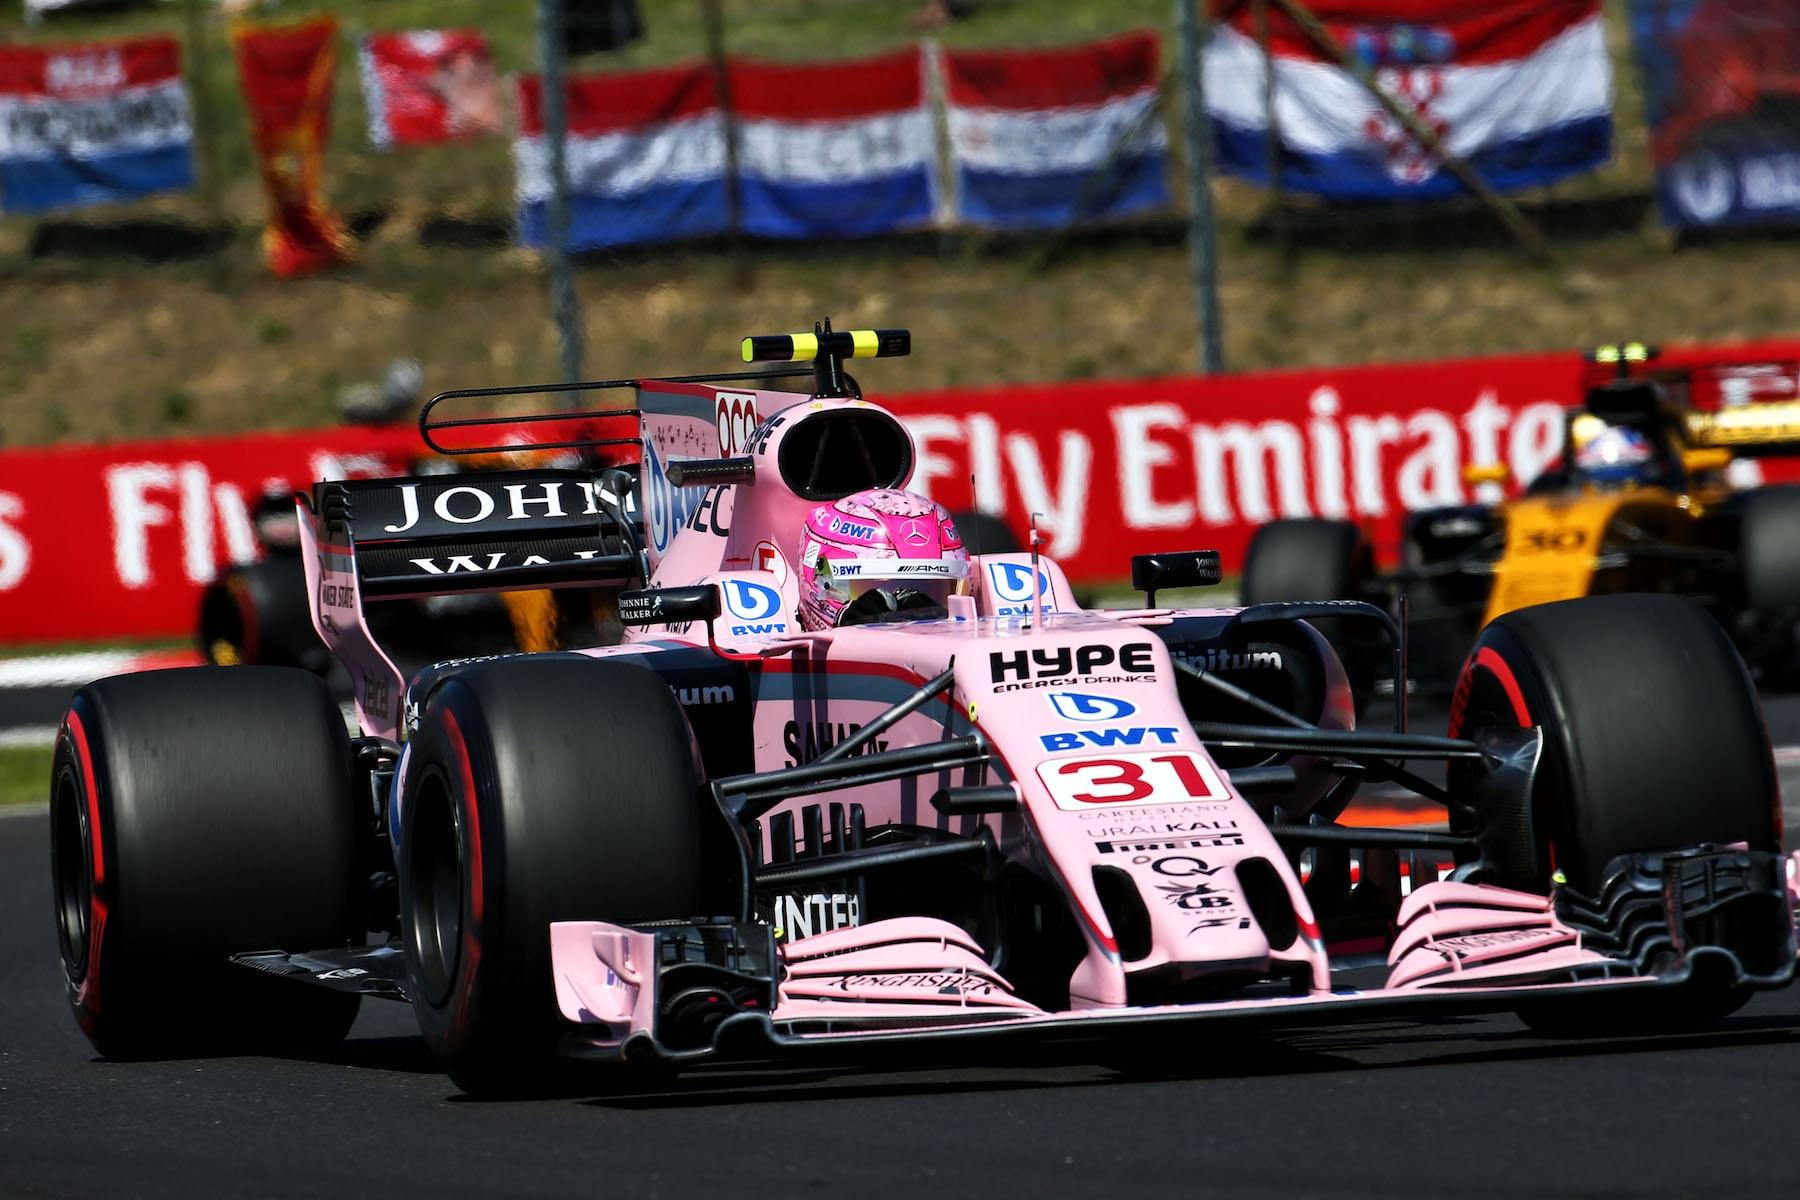 D 2017 Esteban Ocon | Force India VJM10 | 2017 Hungarian GP 1 copy.jpg